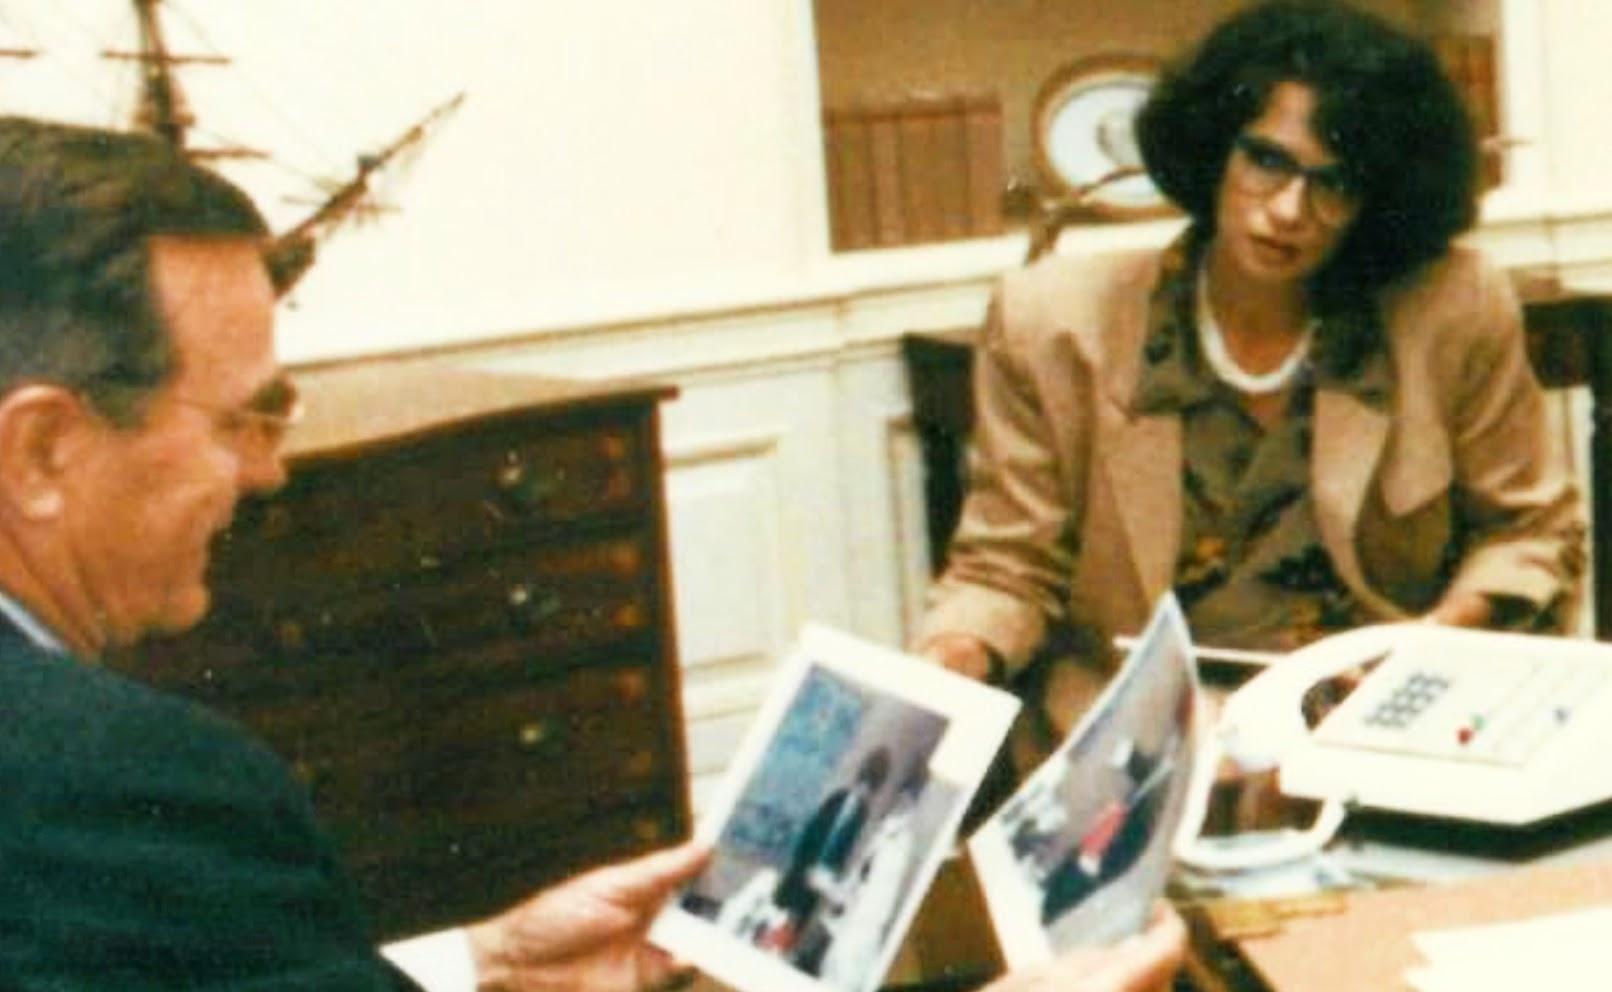 Joanna Mendez with President Bush Sr